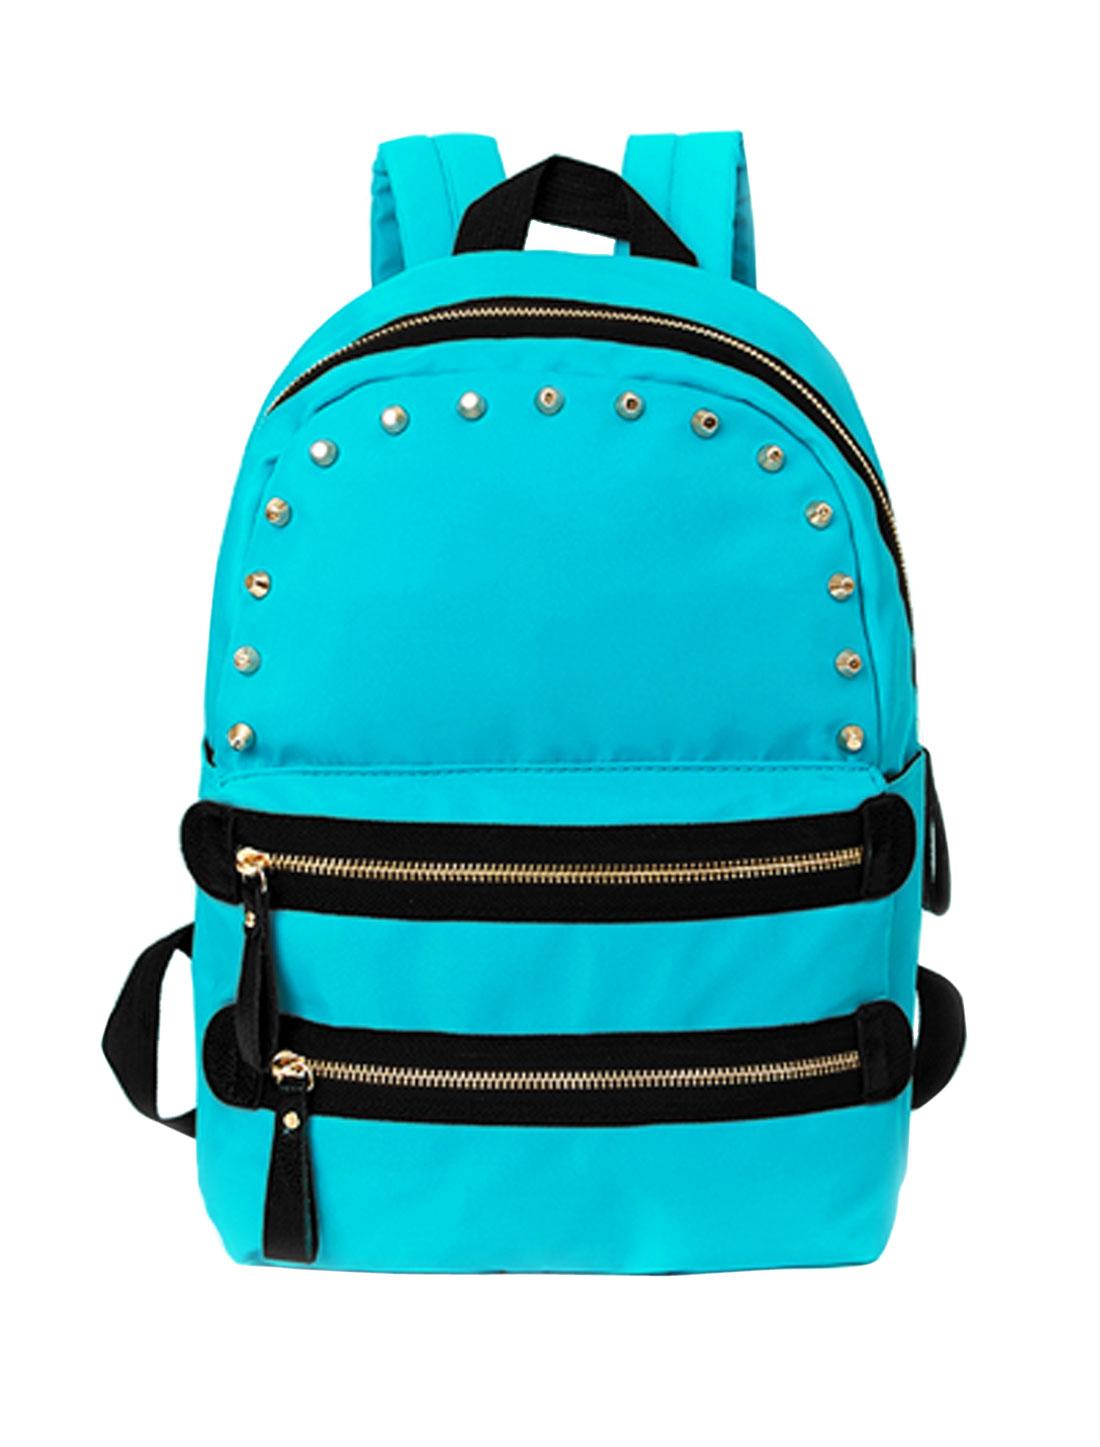 Women Studs Decor Adjustable Straps Zippered Tarpaulins Backpack Blue